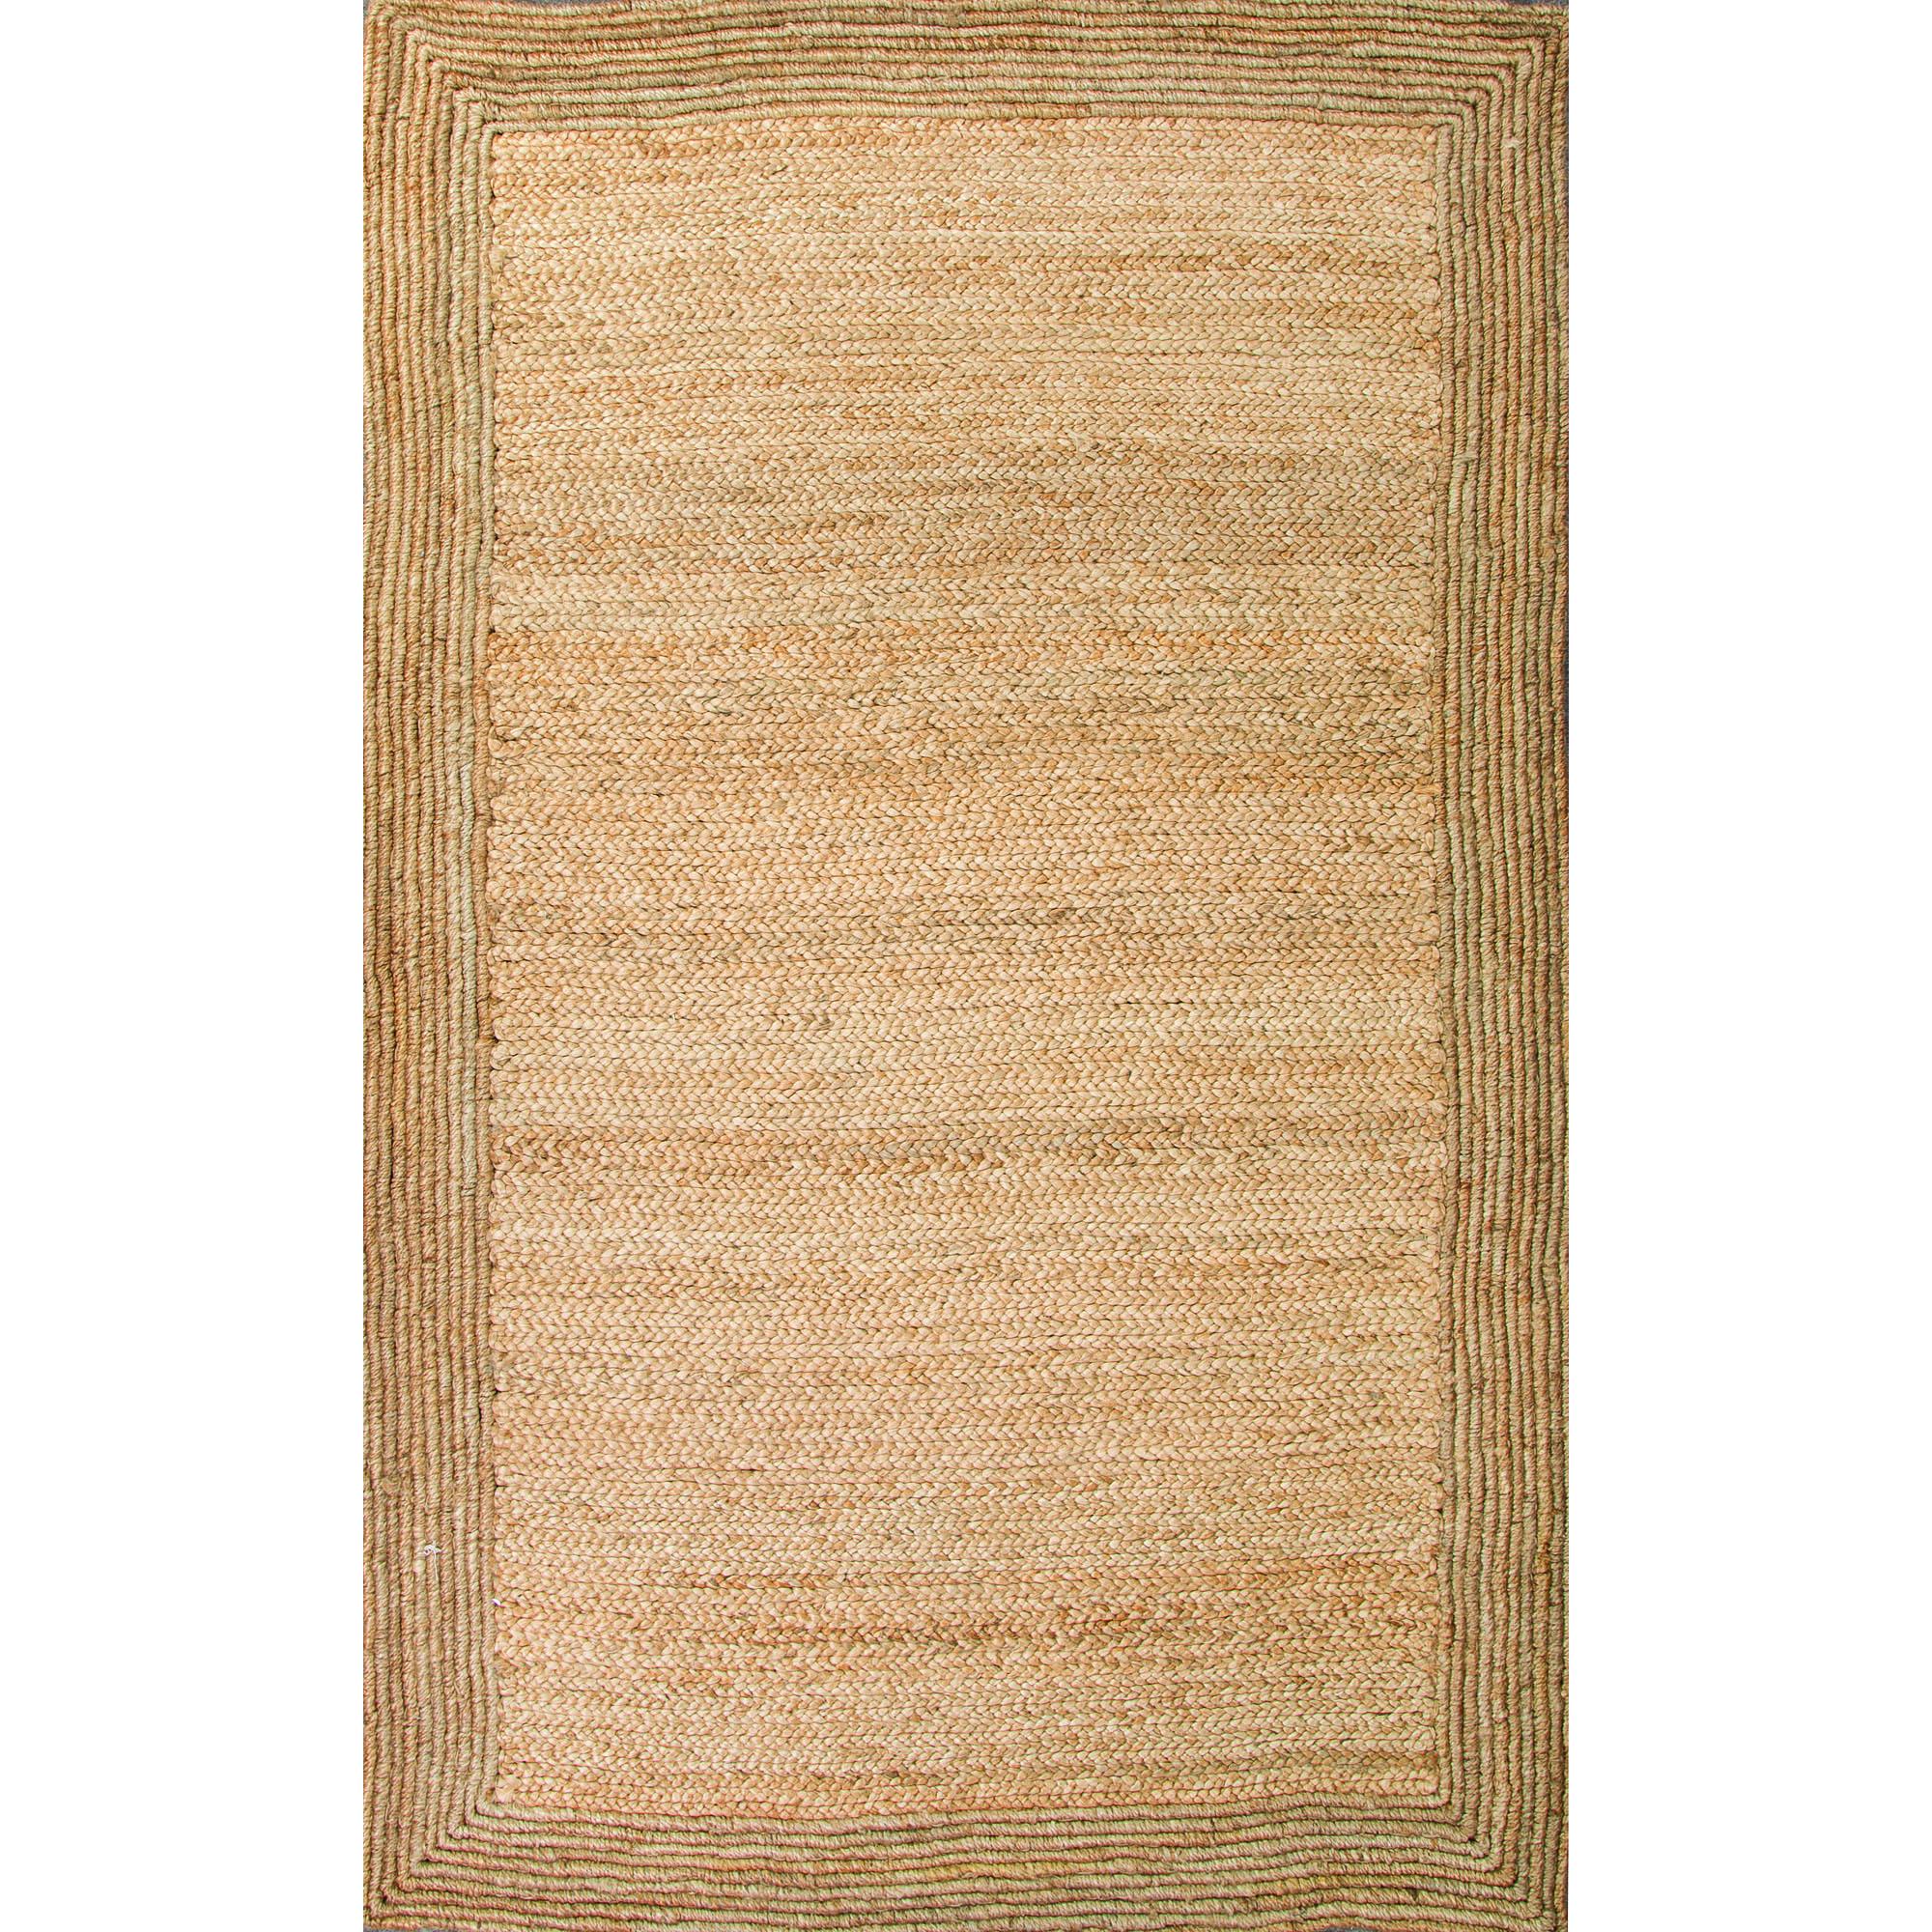 JAIPUR Rugs Naturals Tobago 8 x 10 Rug - Item Number: RUG112478